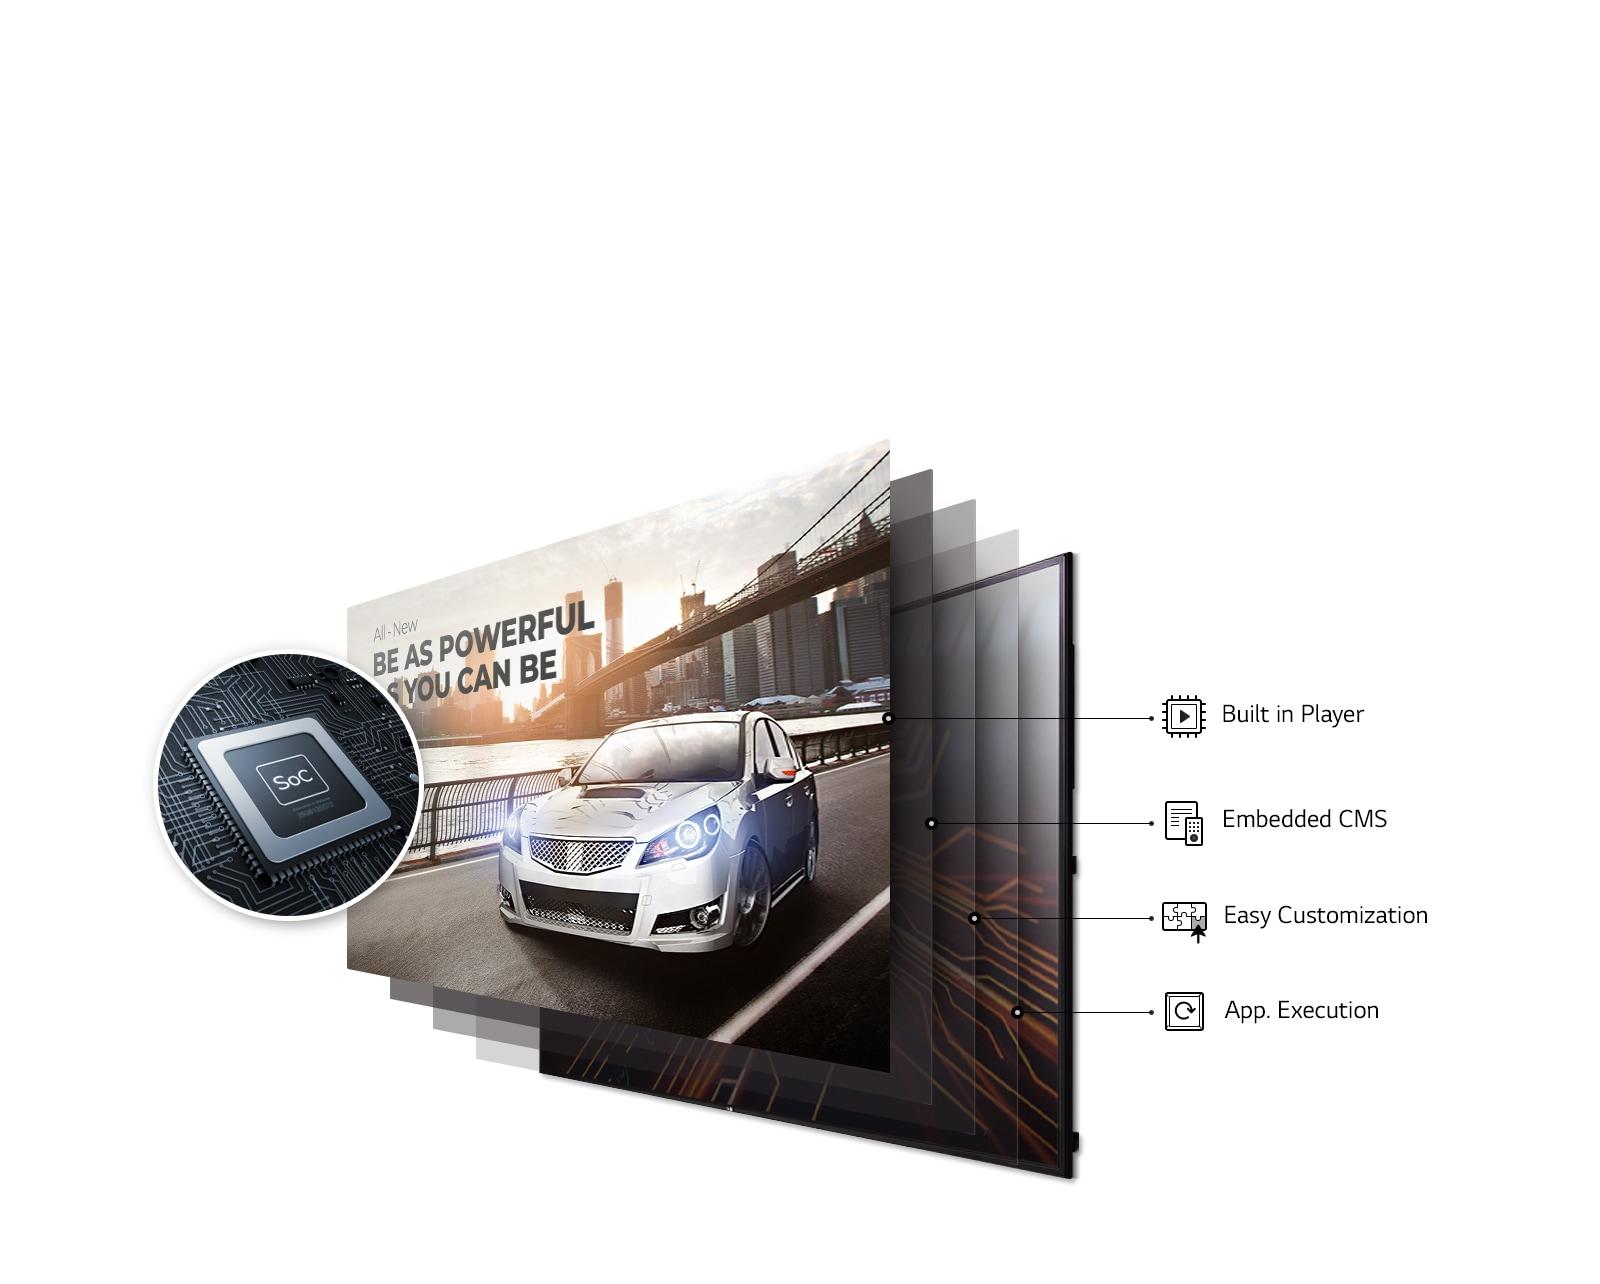 UH5C_02_M01_High-Performance-Smart-Platform_1524114401741